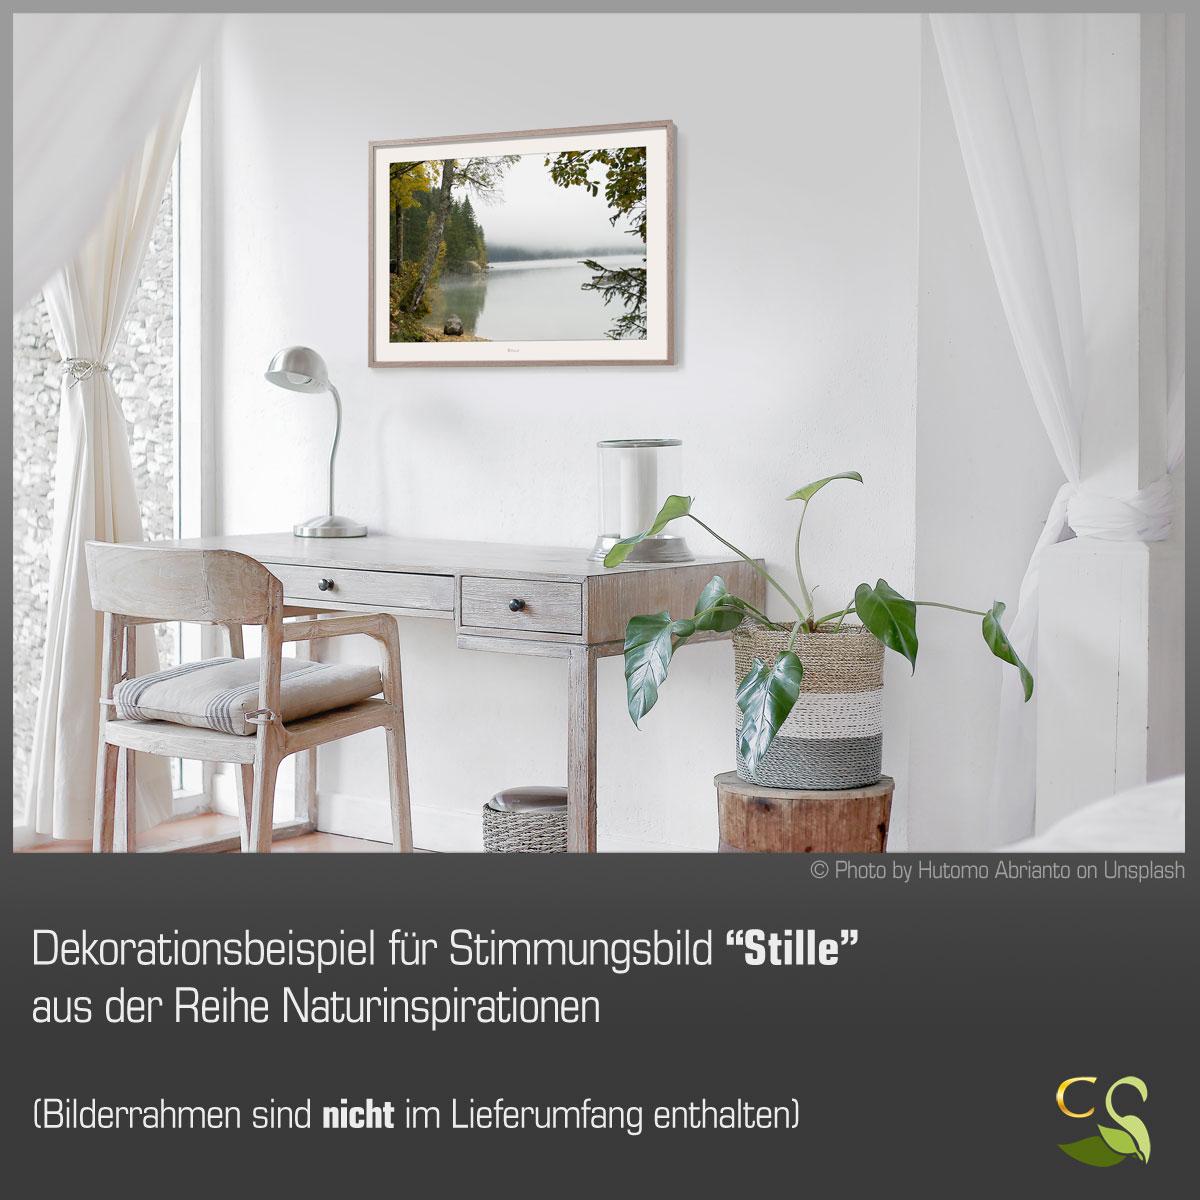 NaturfStilleDeko